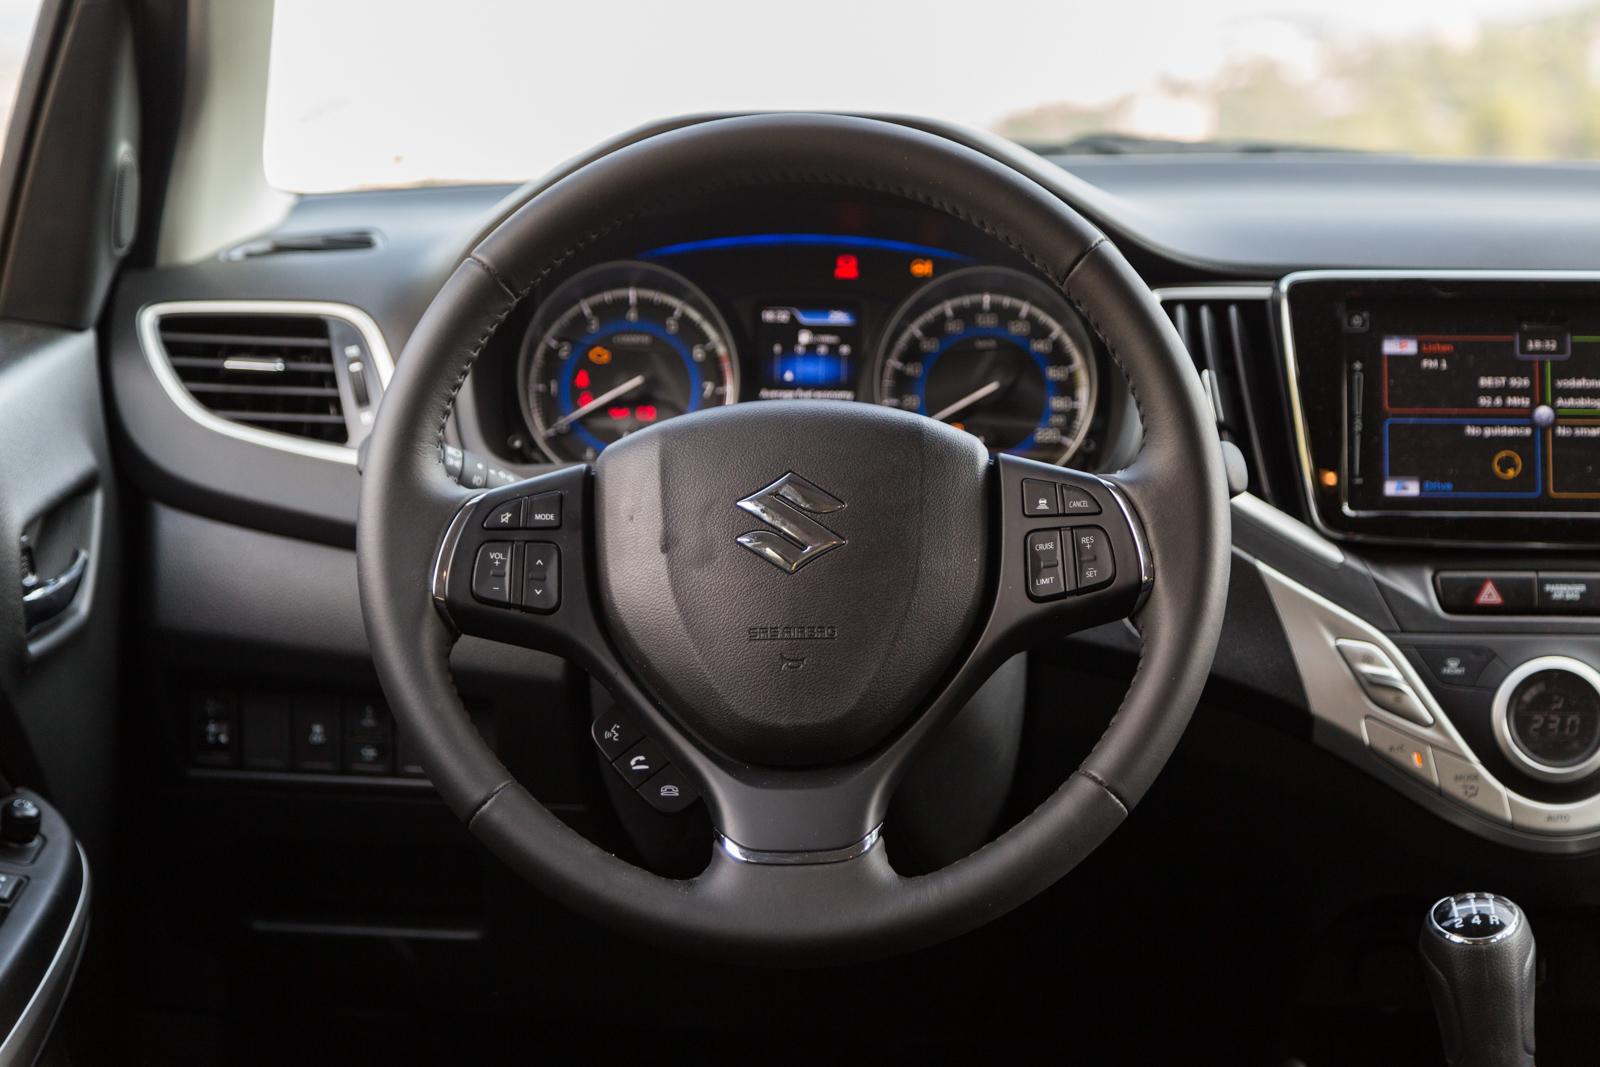 Test_Drive_Suzuki_Baleno_BoosterJet_41